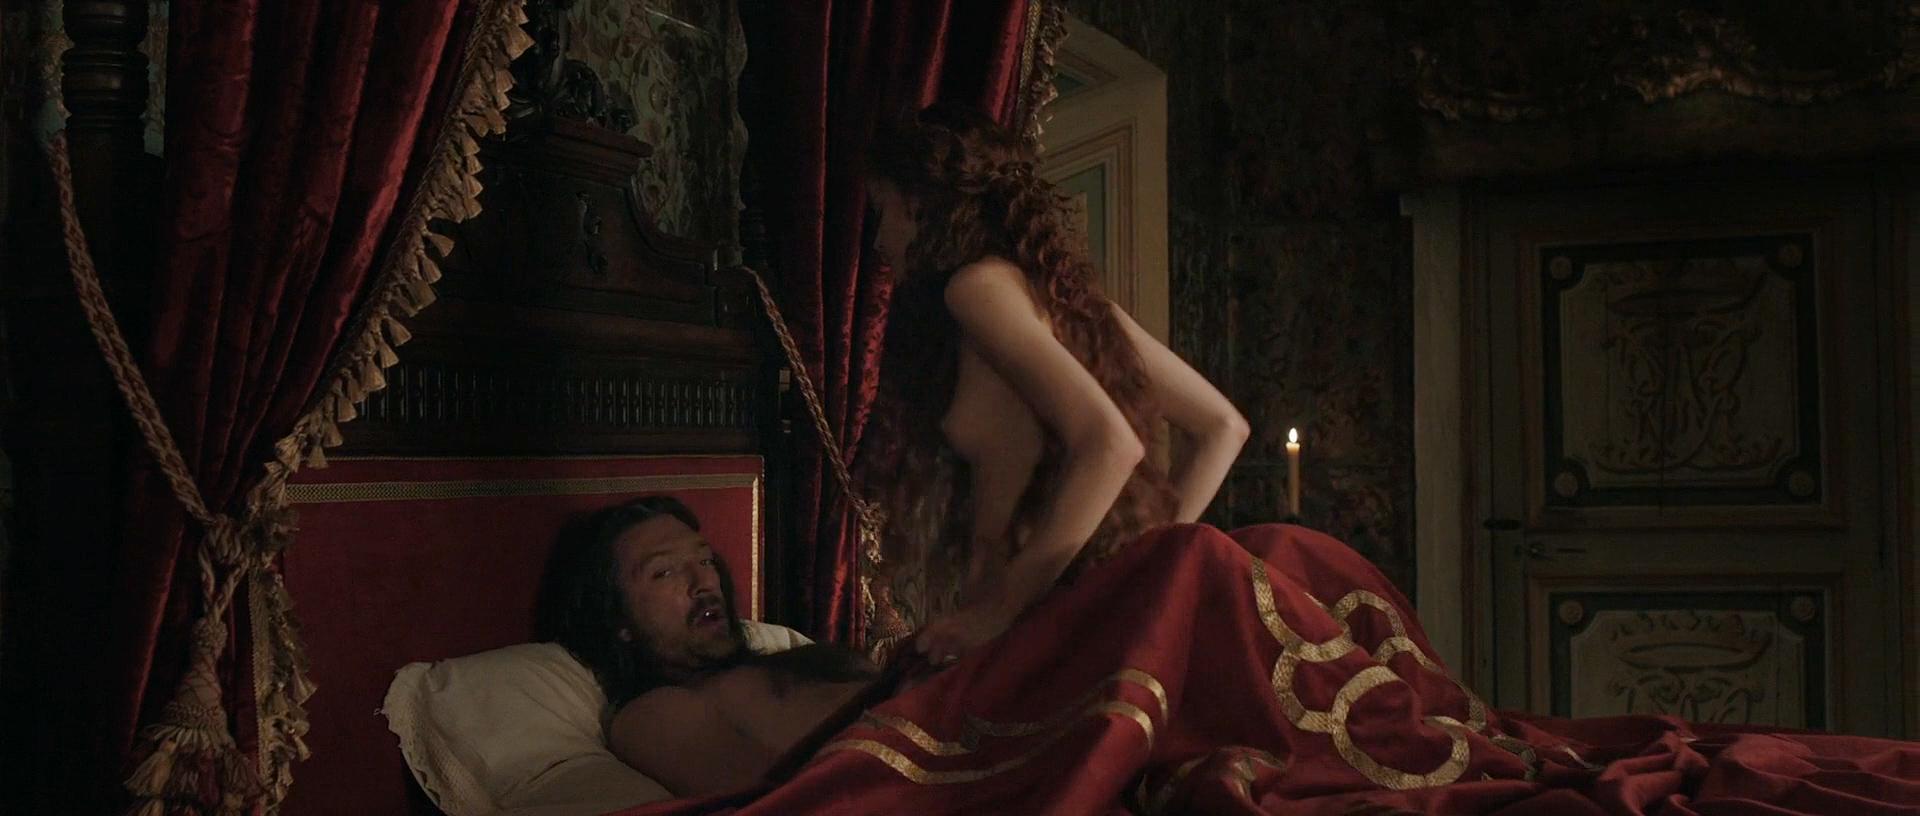 Stacy Martin nude butt others nude - Il racconto dei racconti (2015) hd1080p (16)